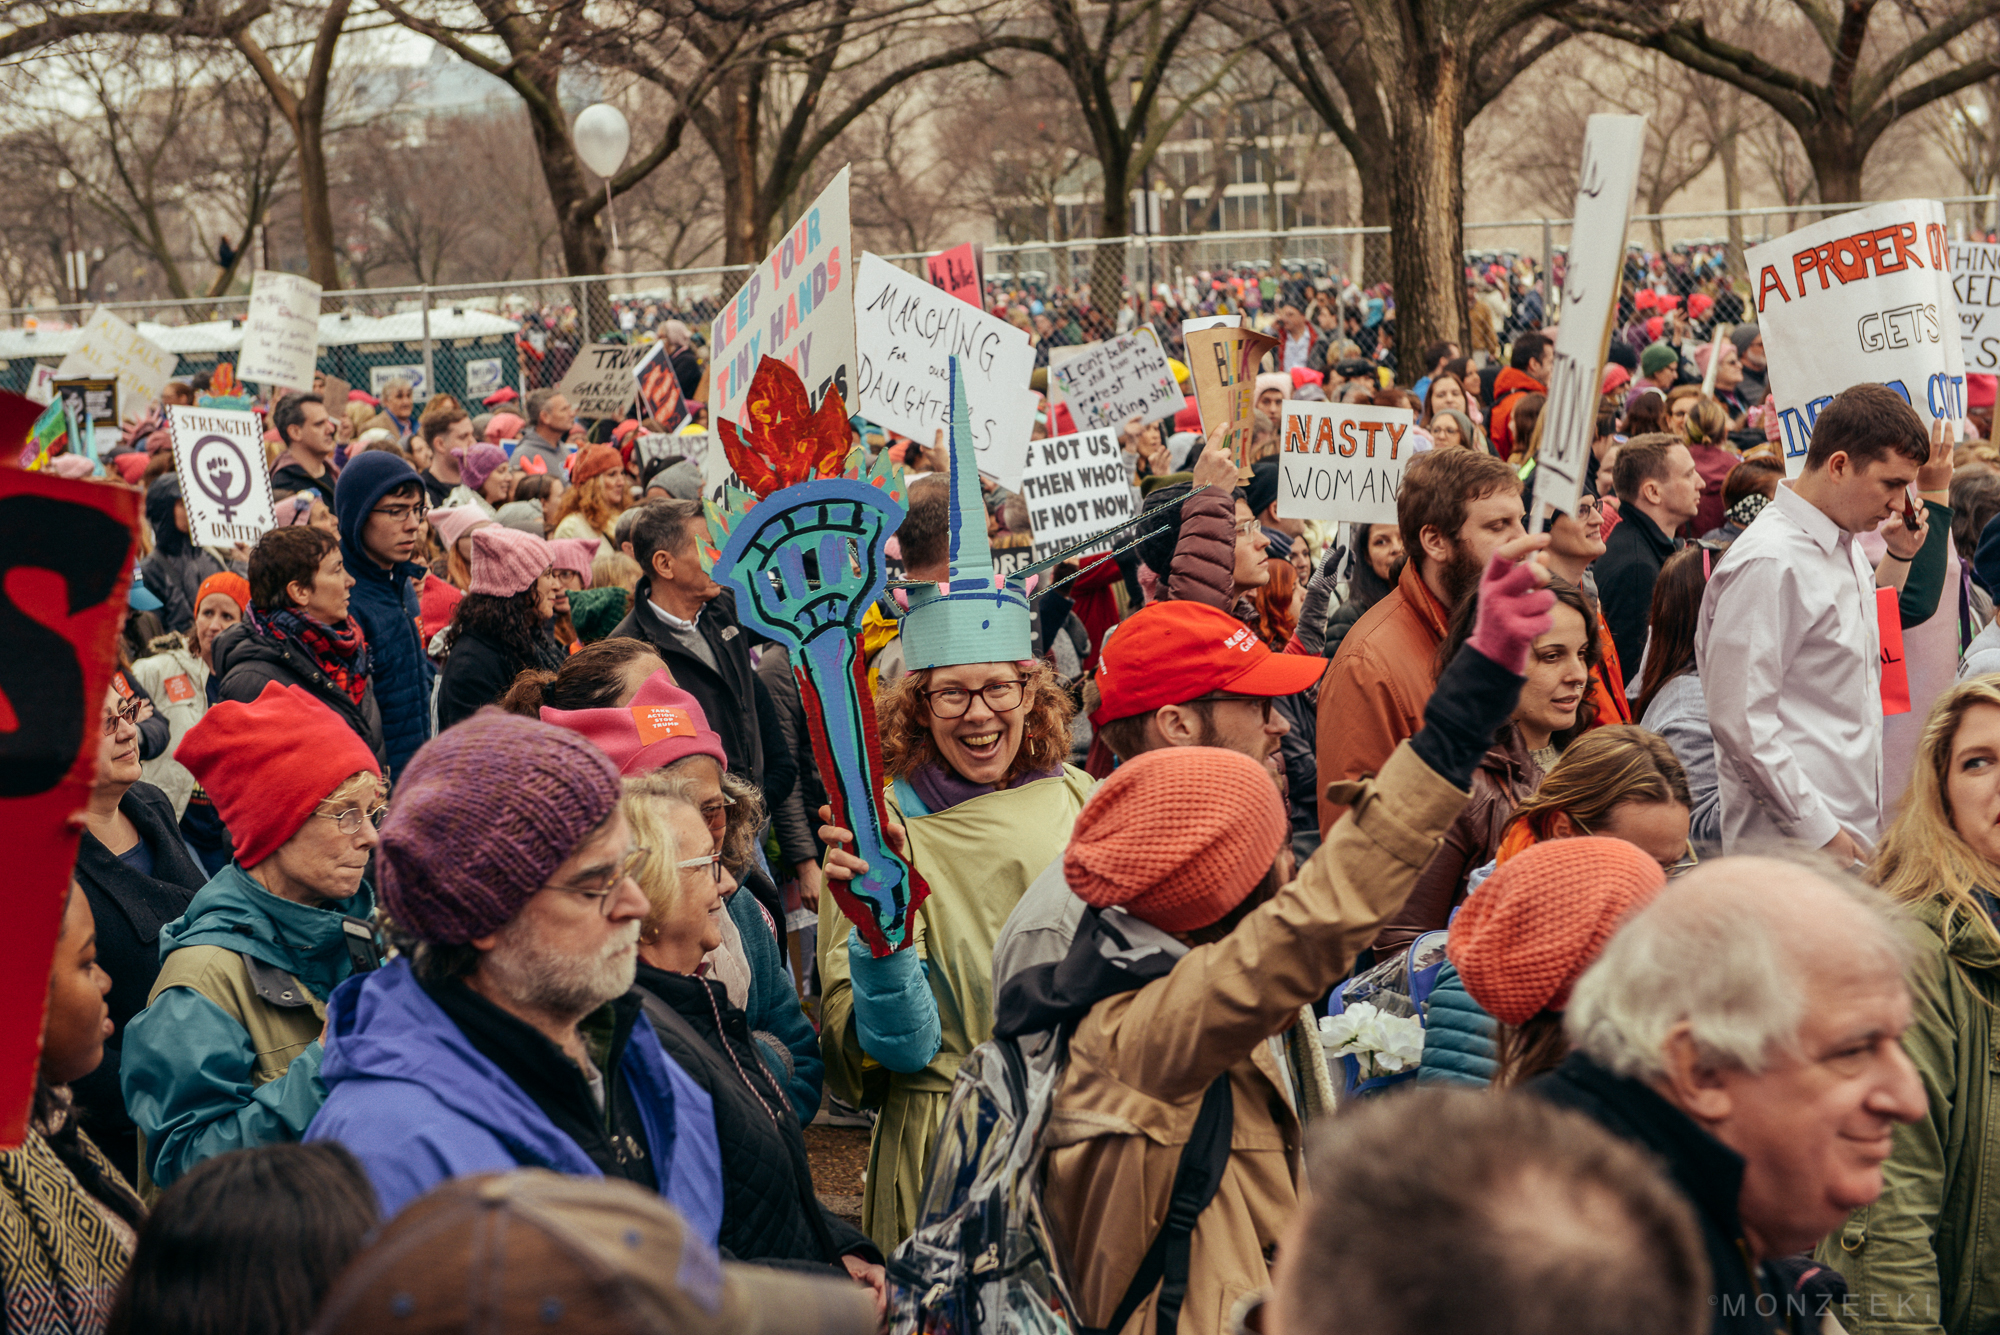 20170121-womens-march-dc-2694.jpg